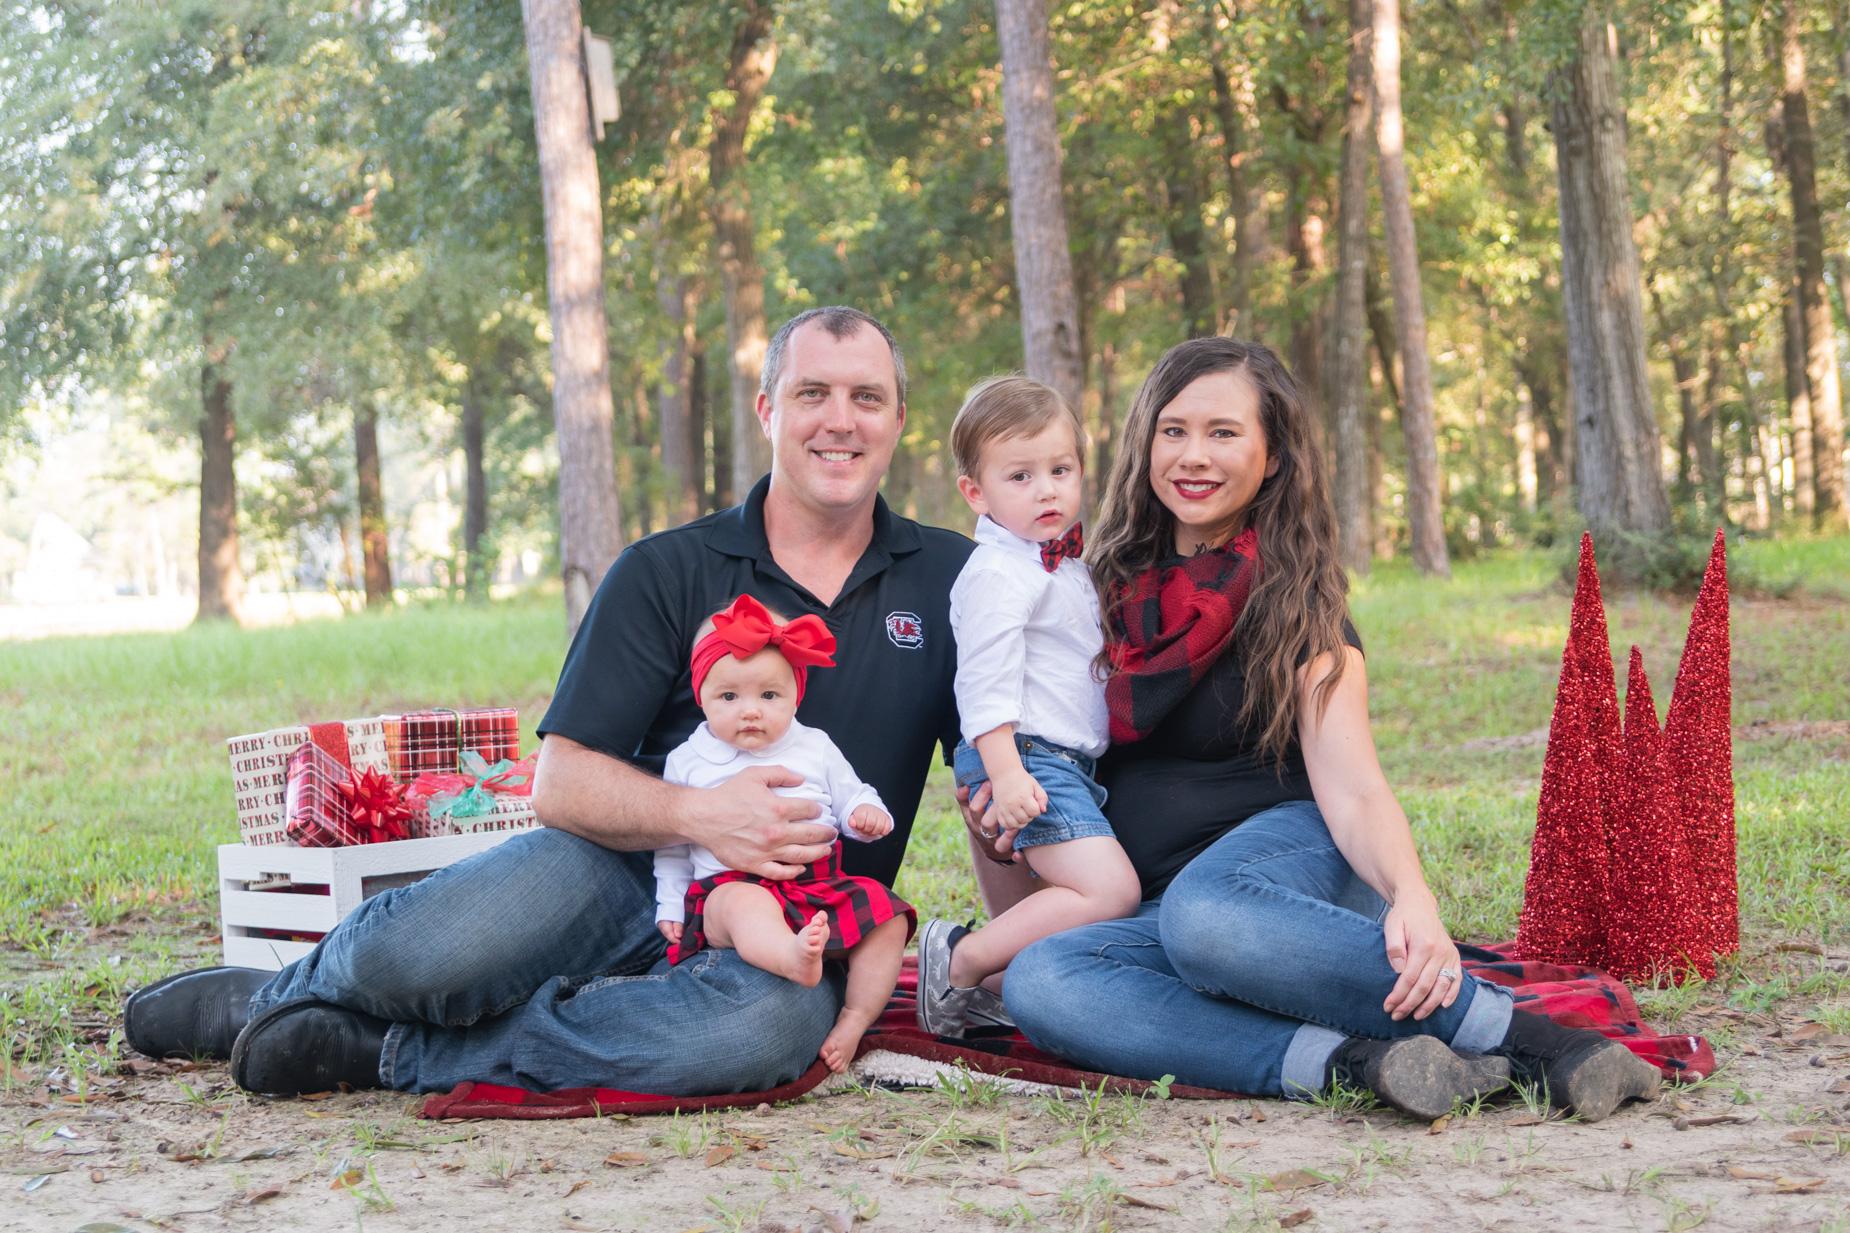 Spring, Texas Family Photographer / Spring Family Photography / P Family